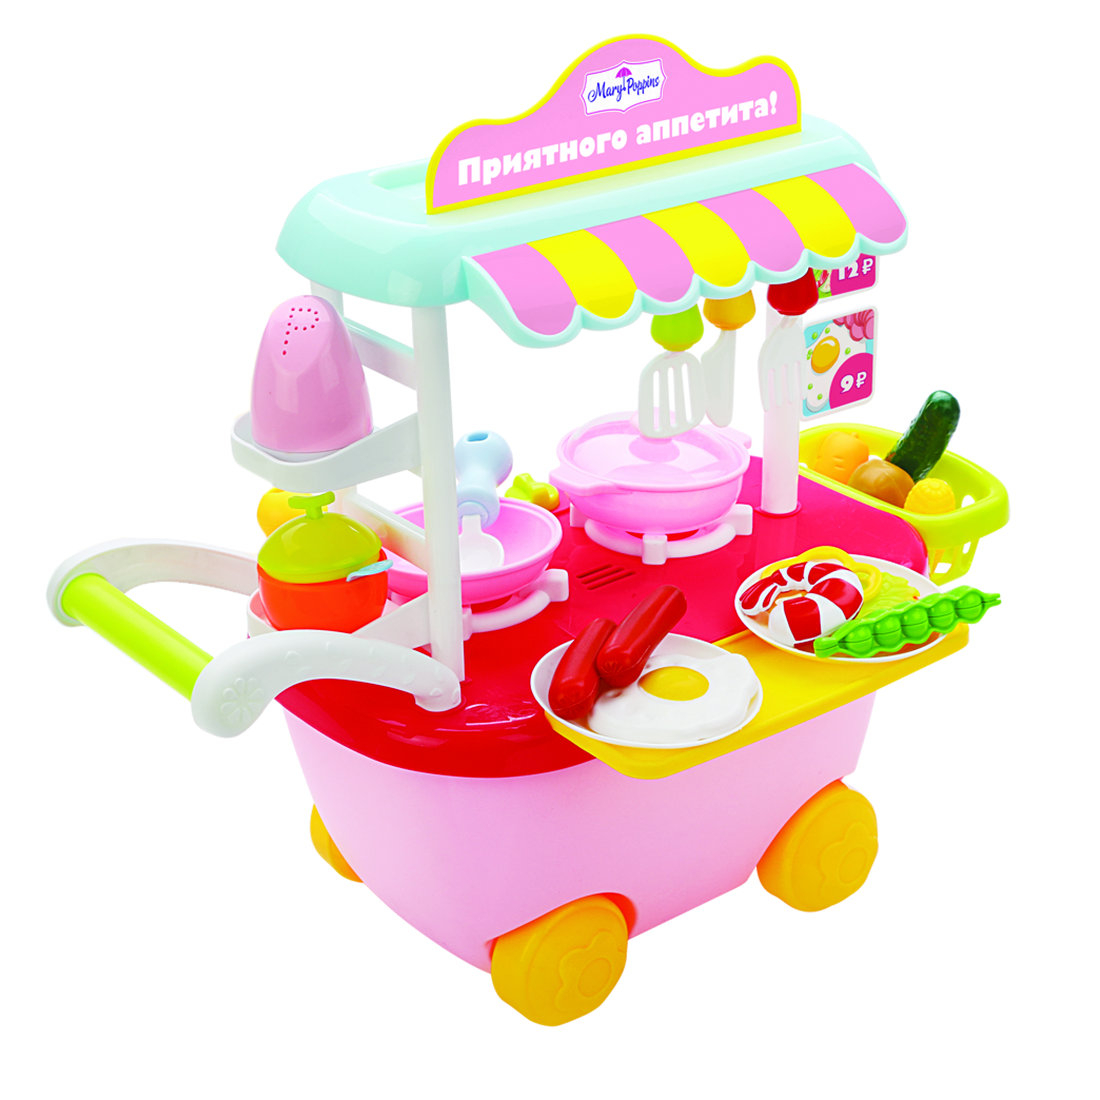 Мебель для кукол Mary Poppins Кафе на колесах Приятного аппетита мангал на колесах фото